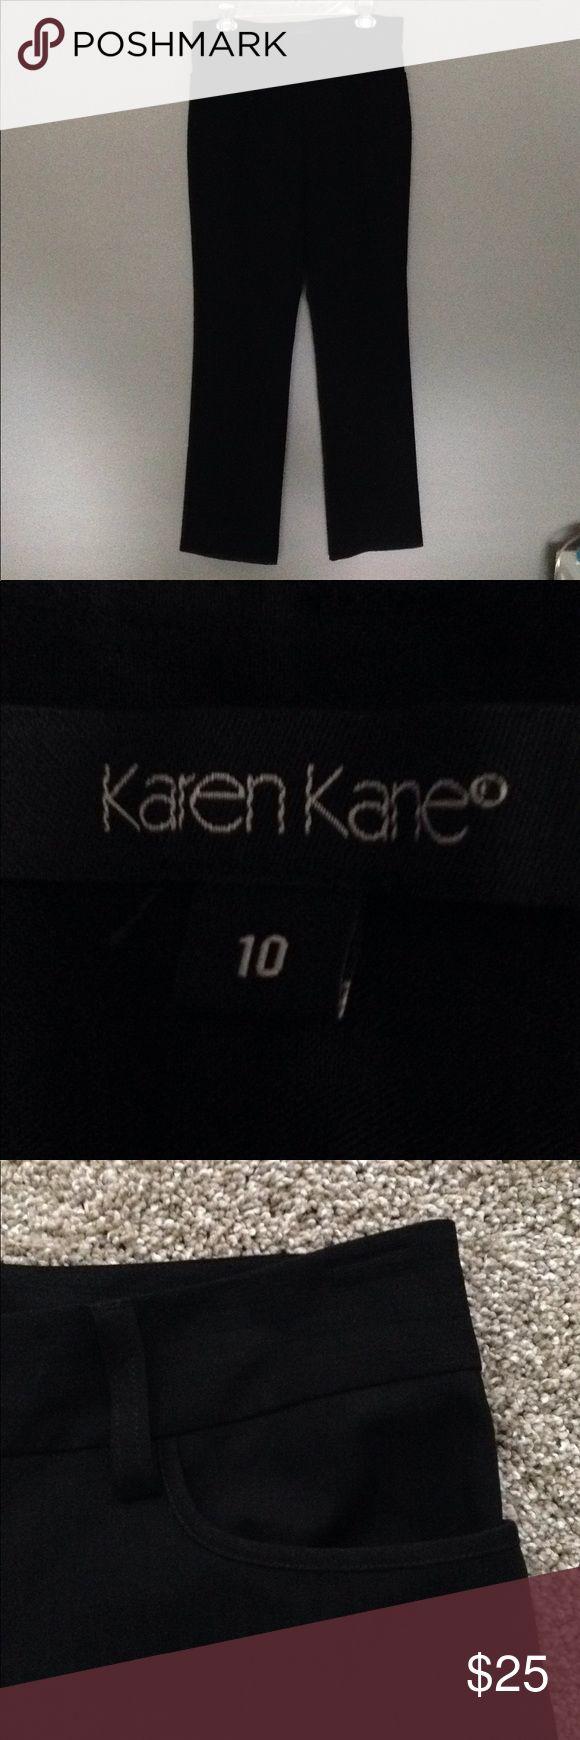 "Karen Kane black striped slacks SZ 10 Beautiful Karen Kane ladies trousers in Size 10 Black on black pinstripe Nice material! 60% polyester 32% rayon and 8% spandex 34"" waist 31"" inseam 2 front pockets Zipper front Never worn New condition Karen Kane Pants Trousers"